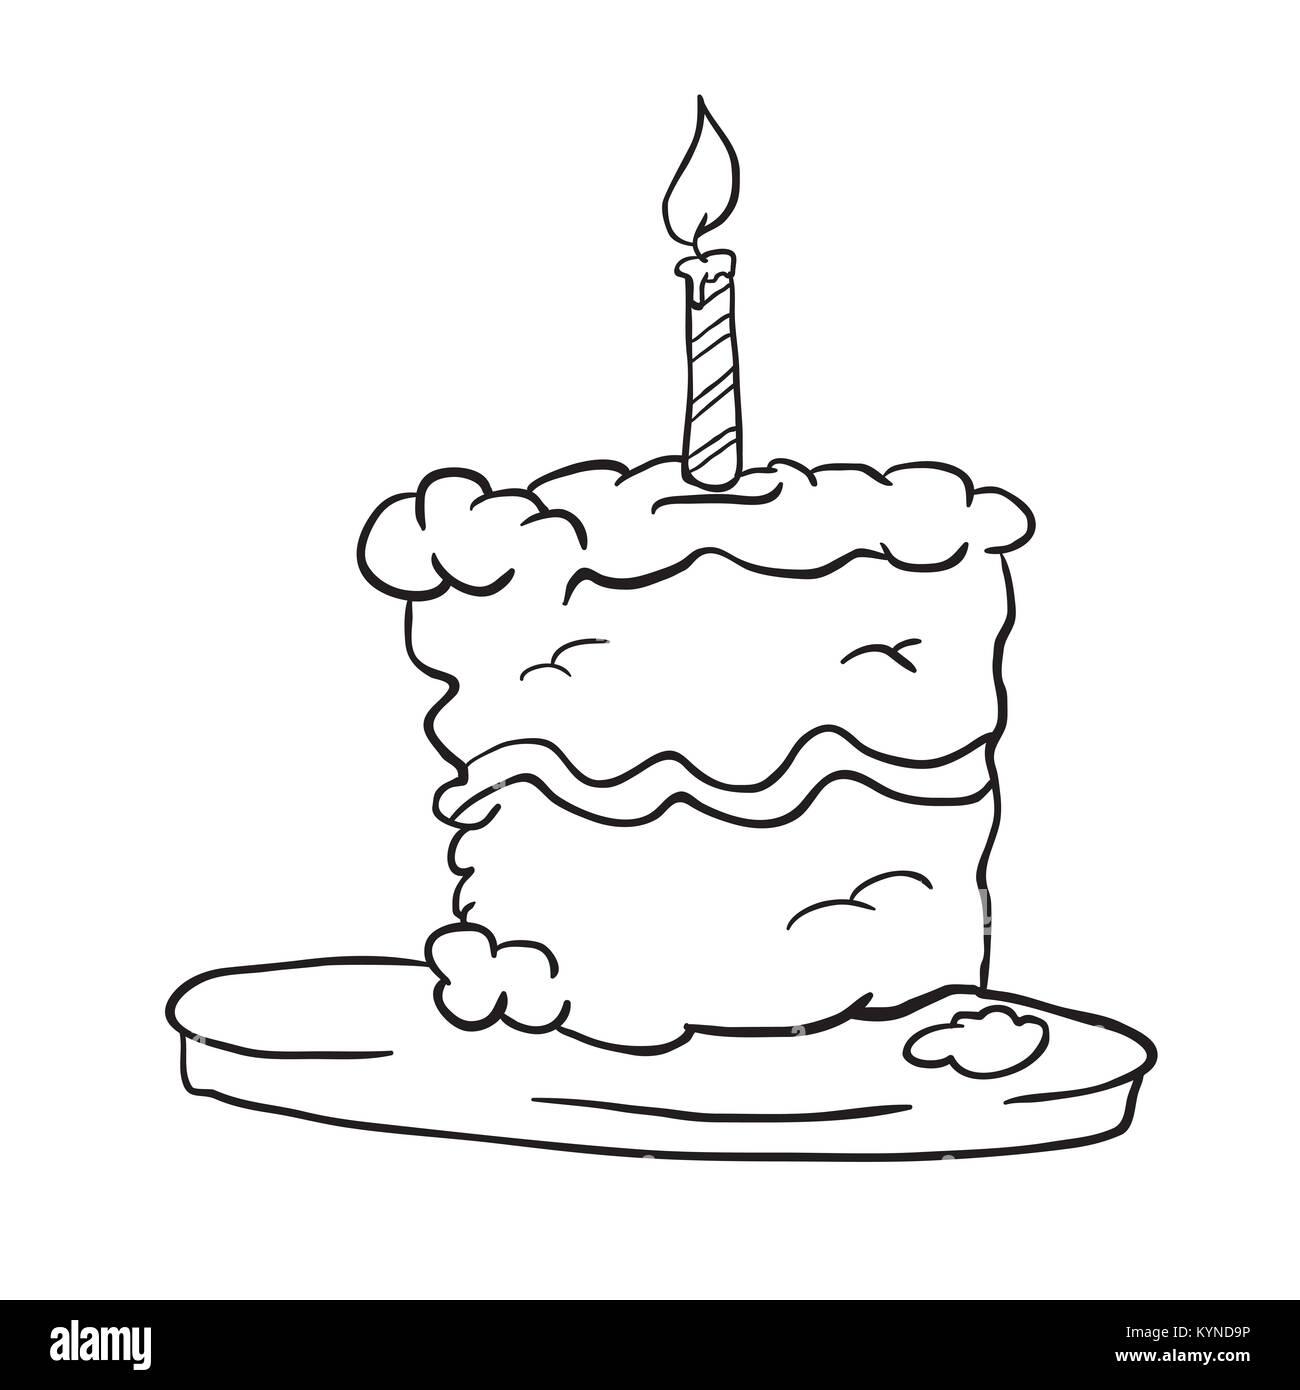 Cake Cartoon Stockfotos & Cake Cartoon Bilder - Alamy